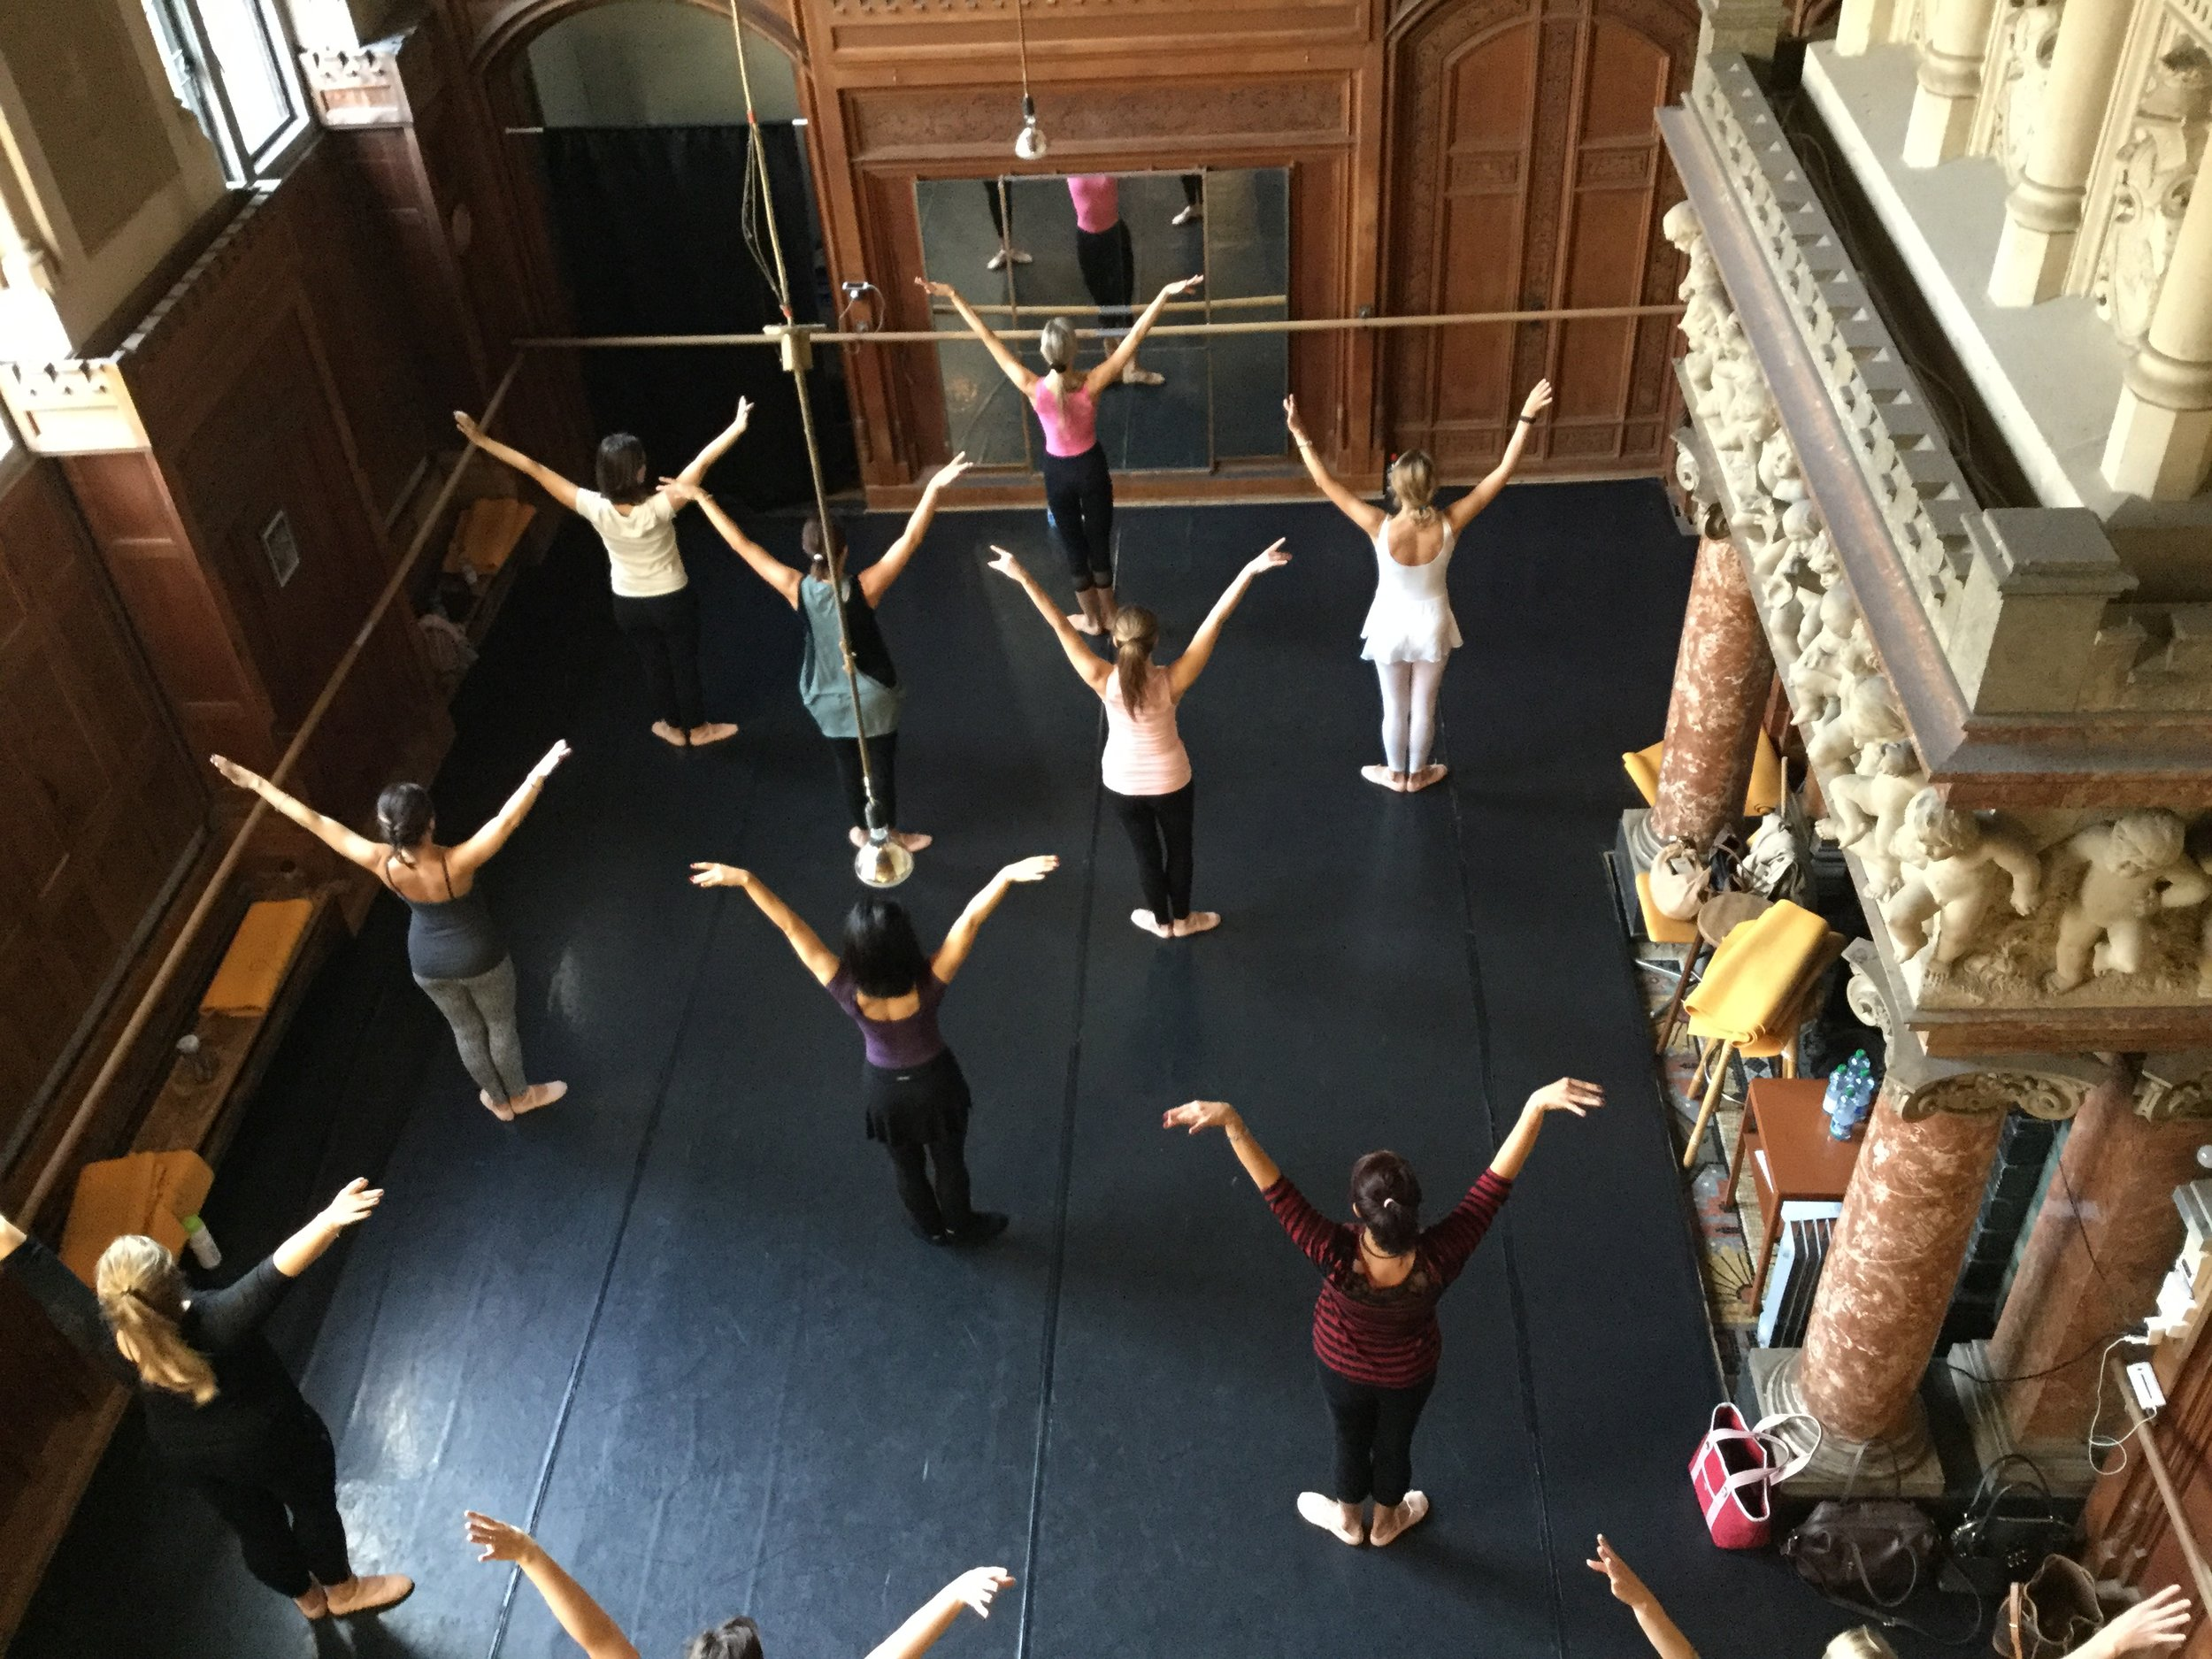 Copy of ballet body sculpture dance classes